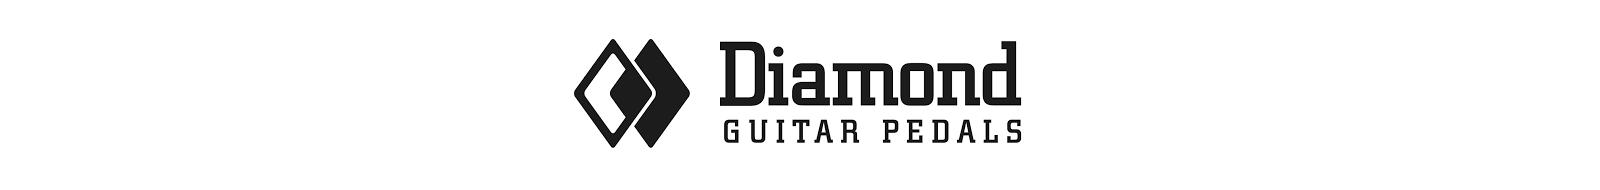 Diamond Guitar Pedals